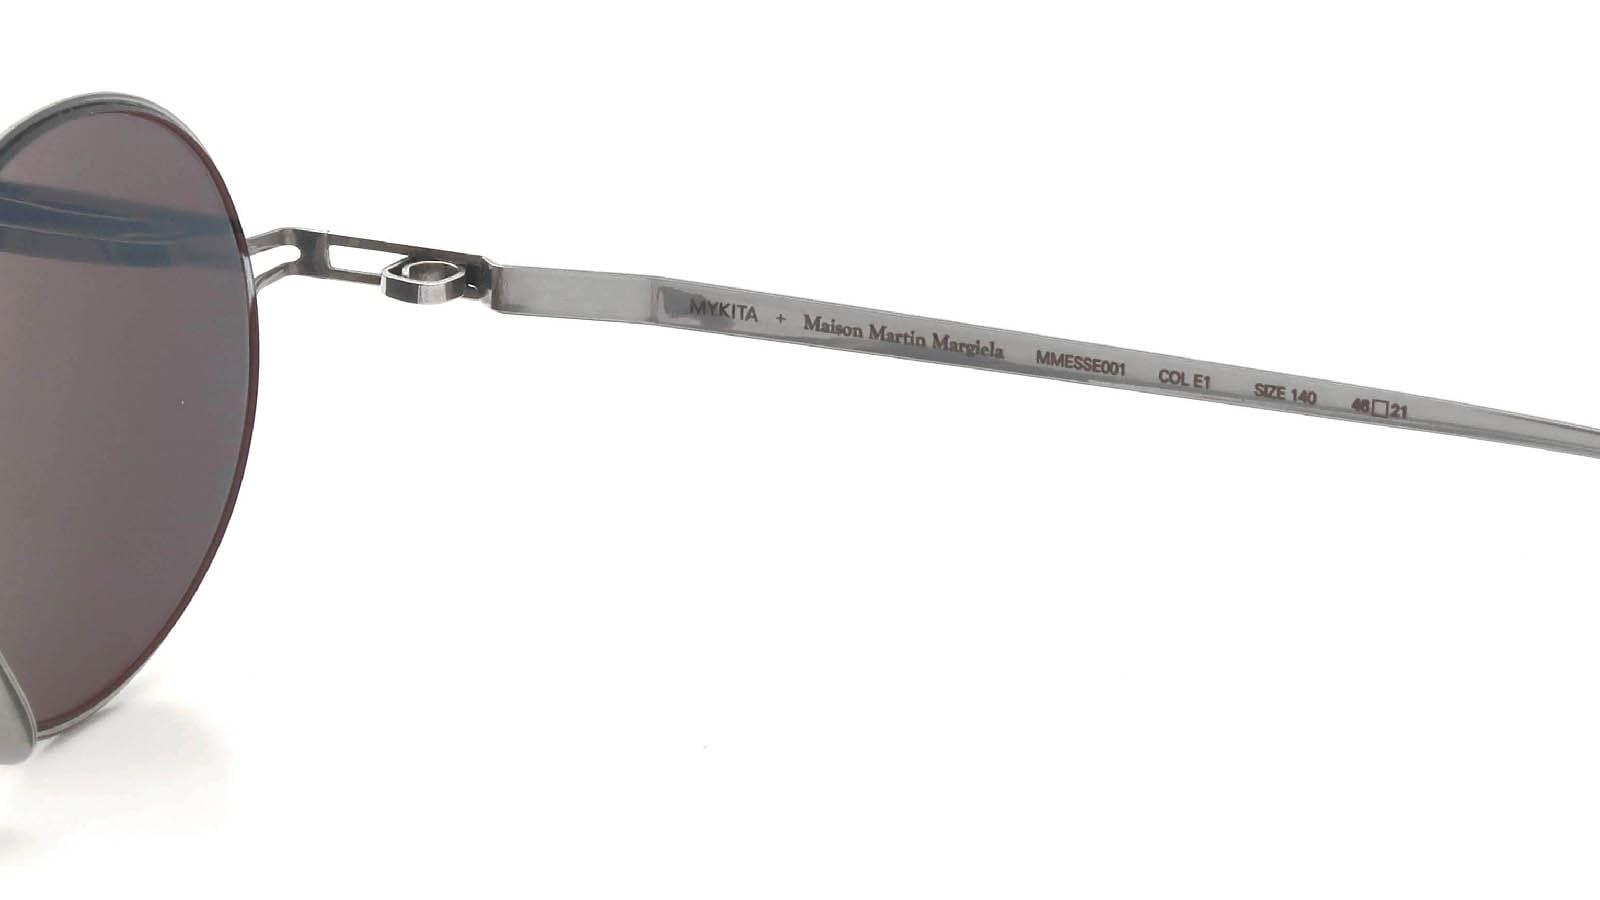 MYKITA + Maison Margiela MMESSE001 COL.E1 Silver /Silver Flash 10